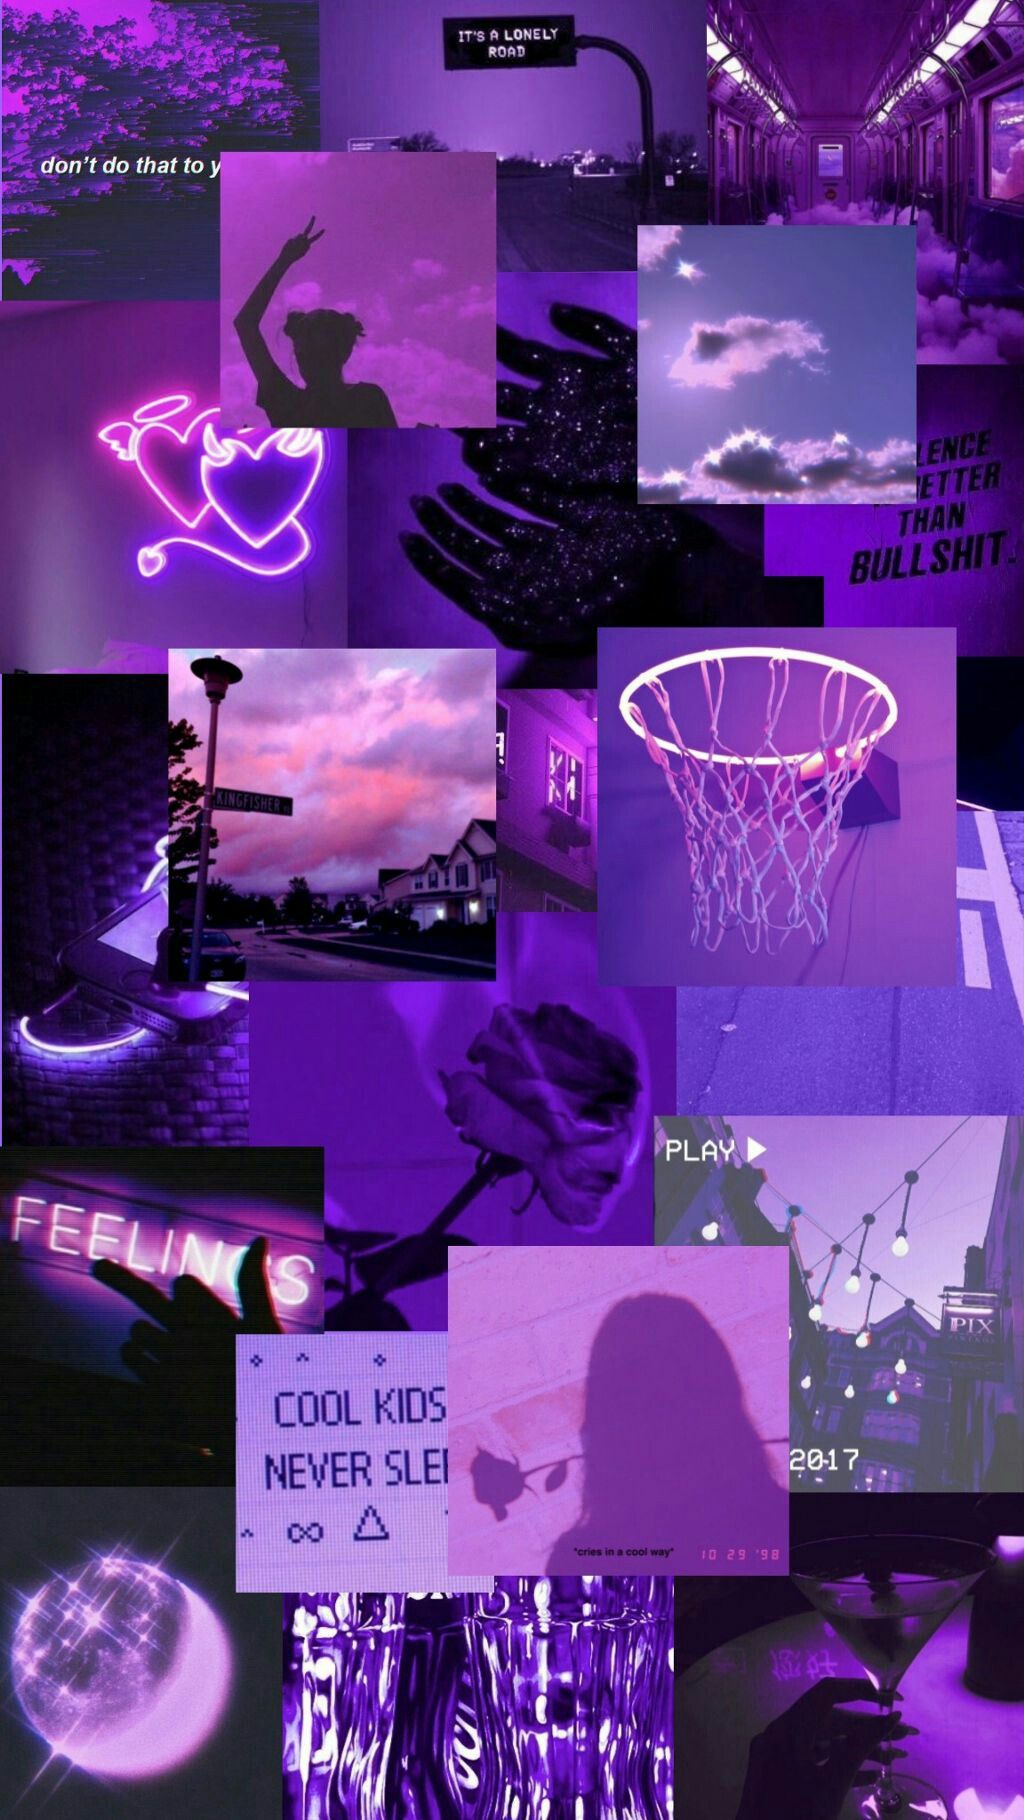 Wallpapers Edit Dark Purple Aesthetic Purpleaesthetic Darkaesthetic Wallpaper Dark Purple Wallpaper Black And Purple Wallpaper Dark Purple Aesthetic